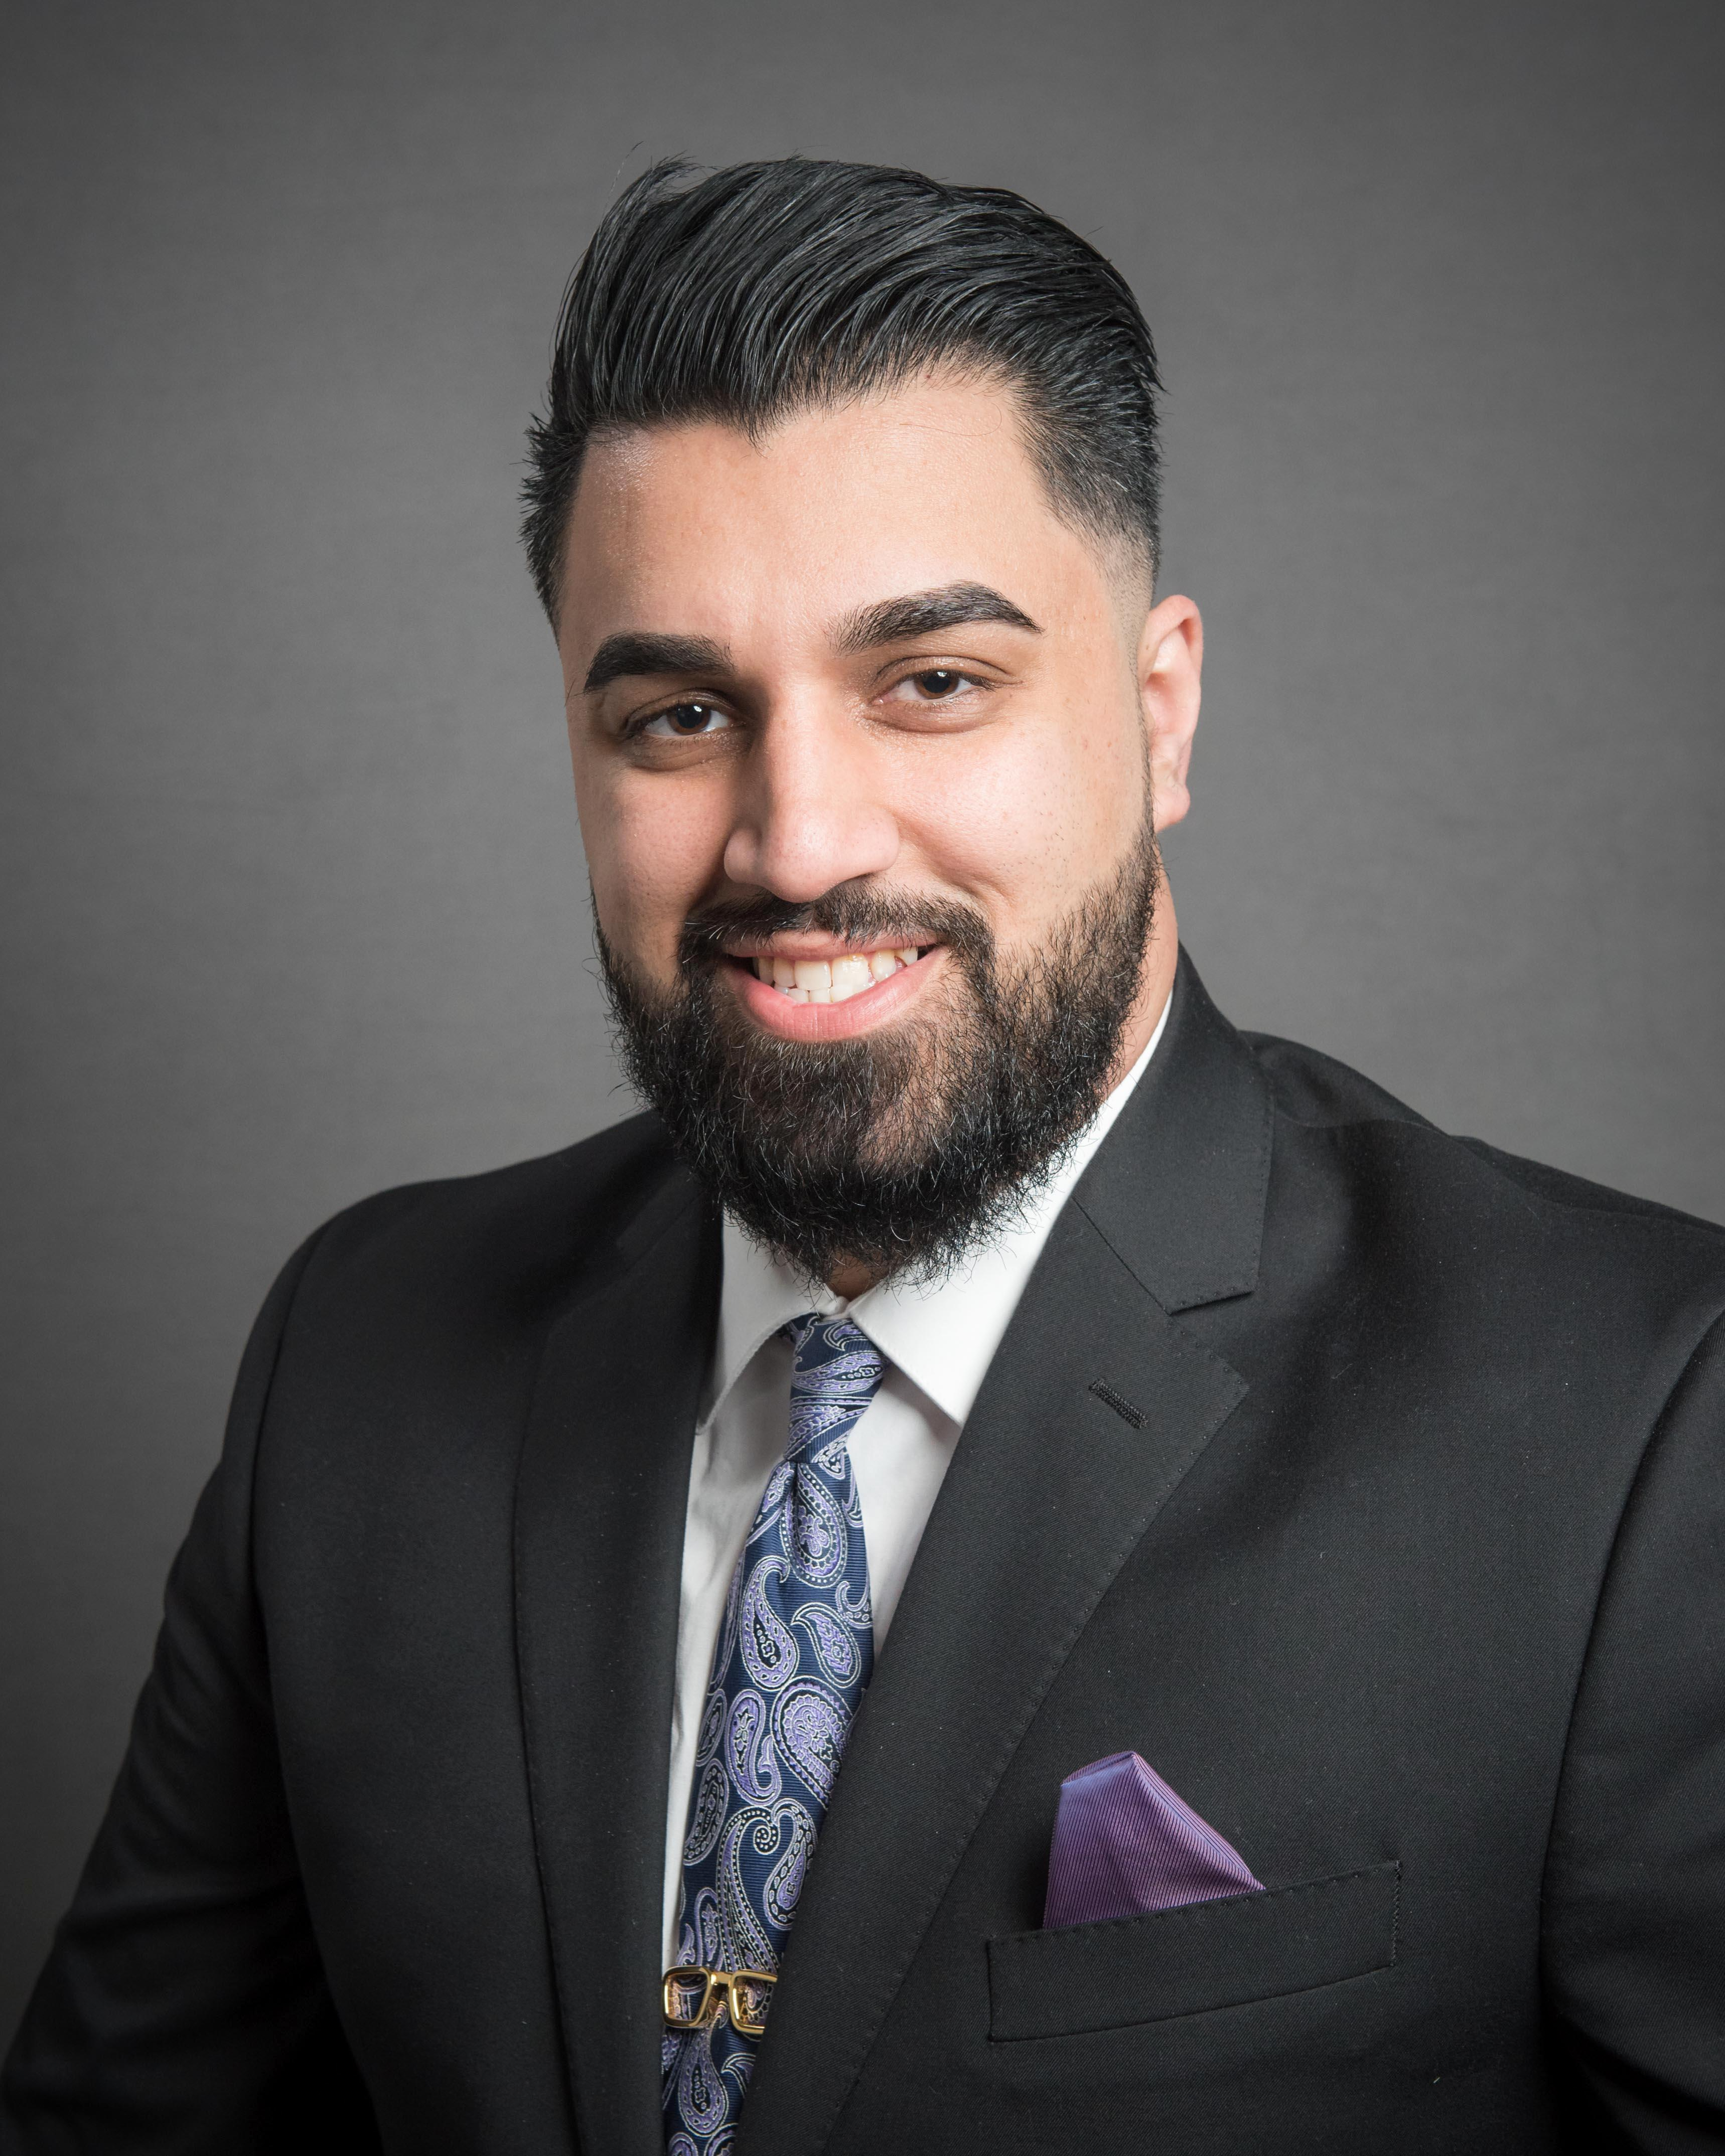 AHMED M. PICKETT  Your Registered Representative & Insurance Agent